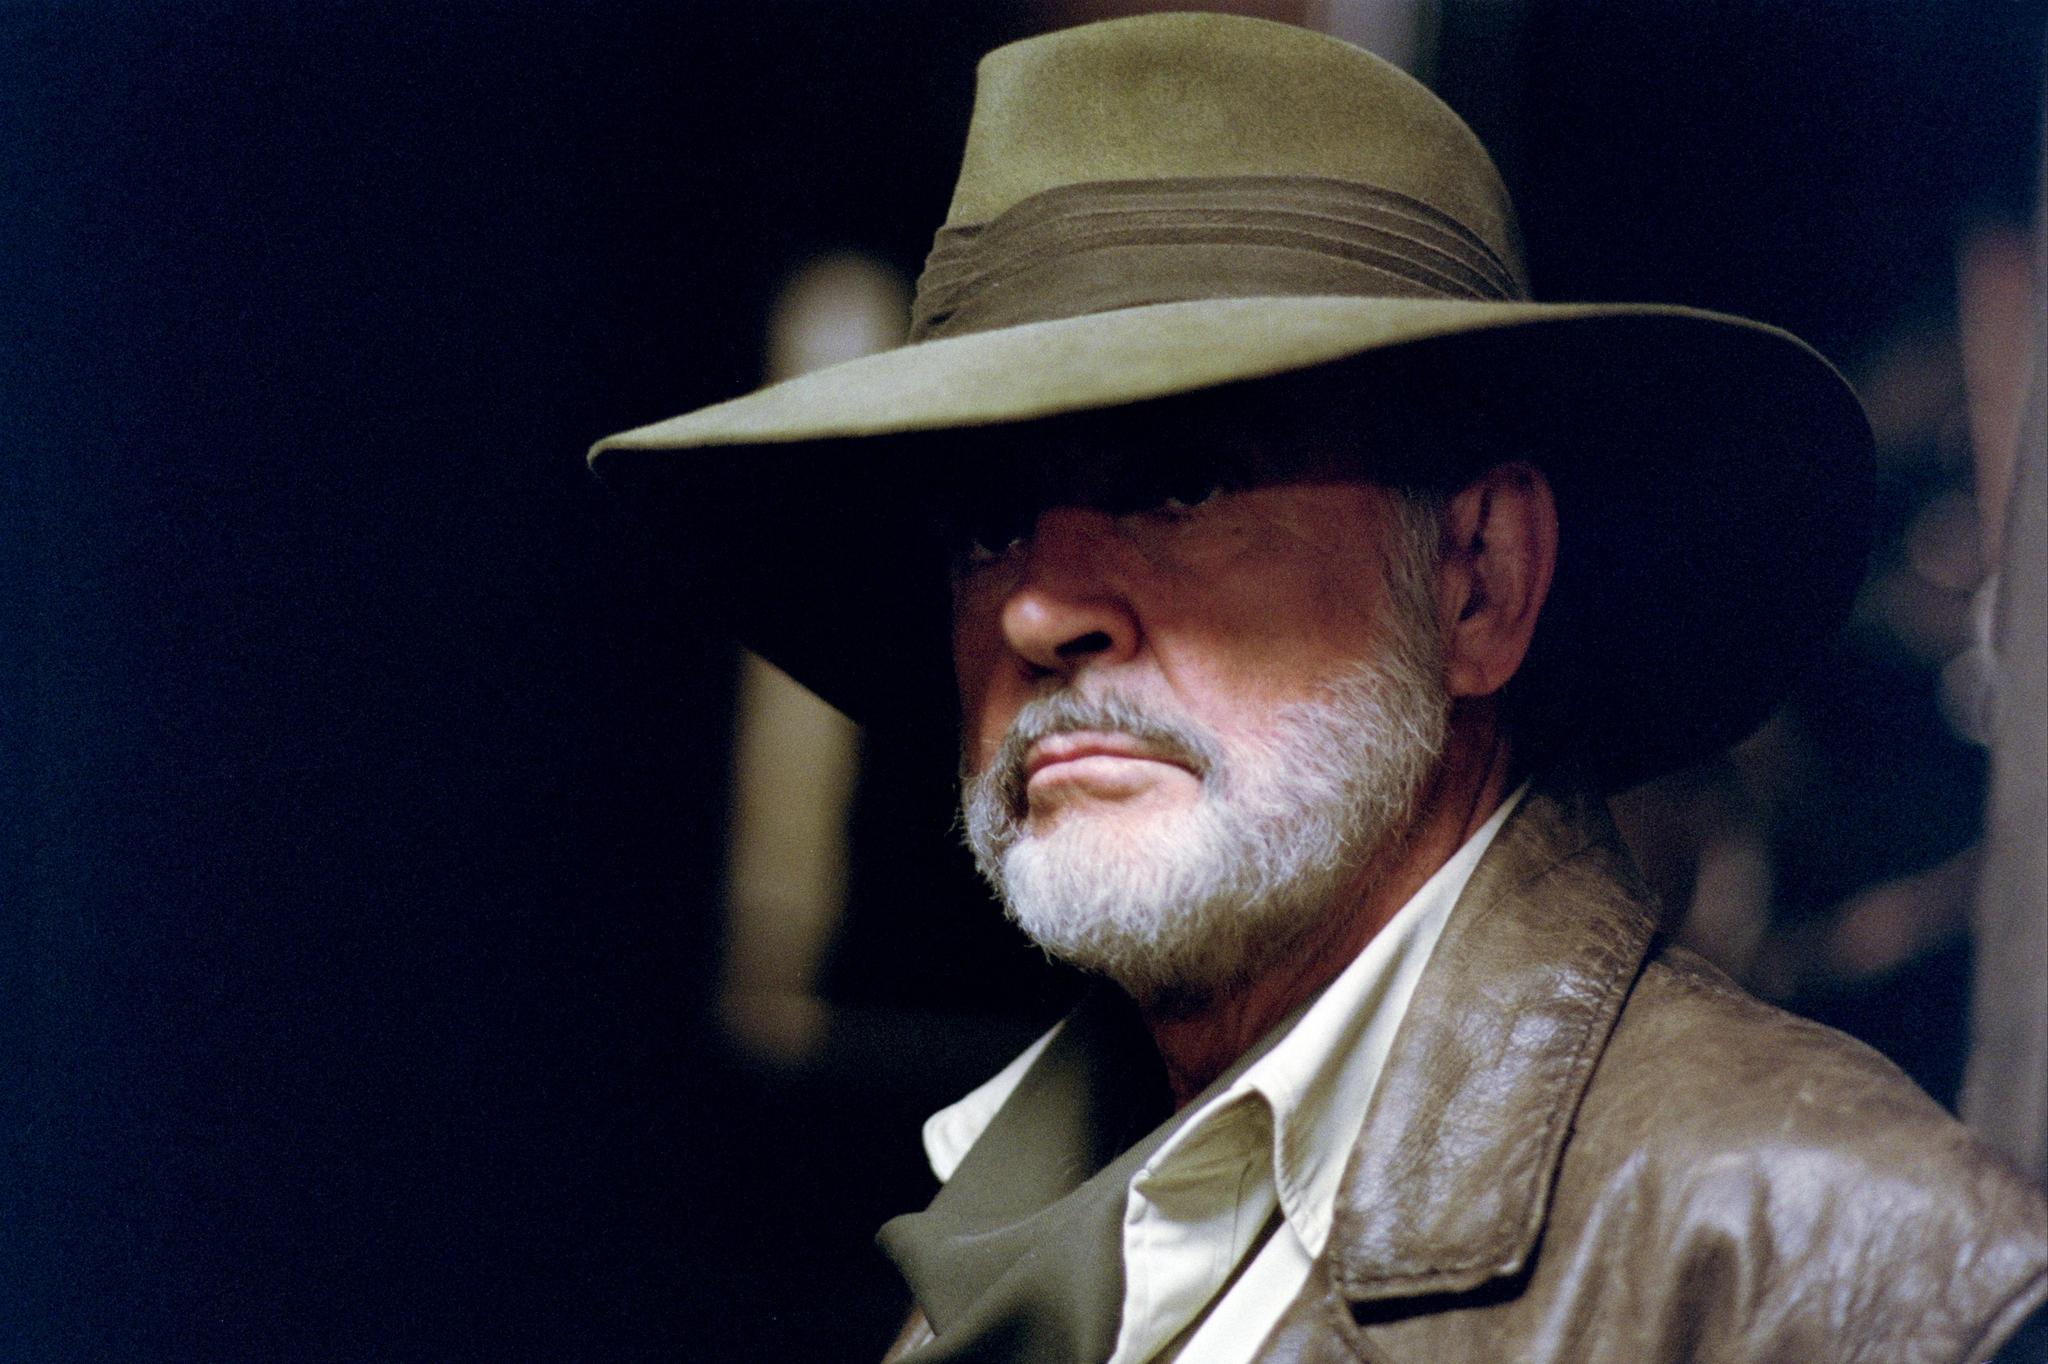 Sean Connery in The League of Extraordinary Gentlemen (2003)